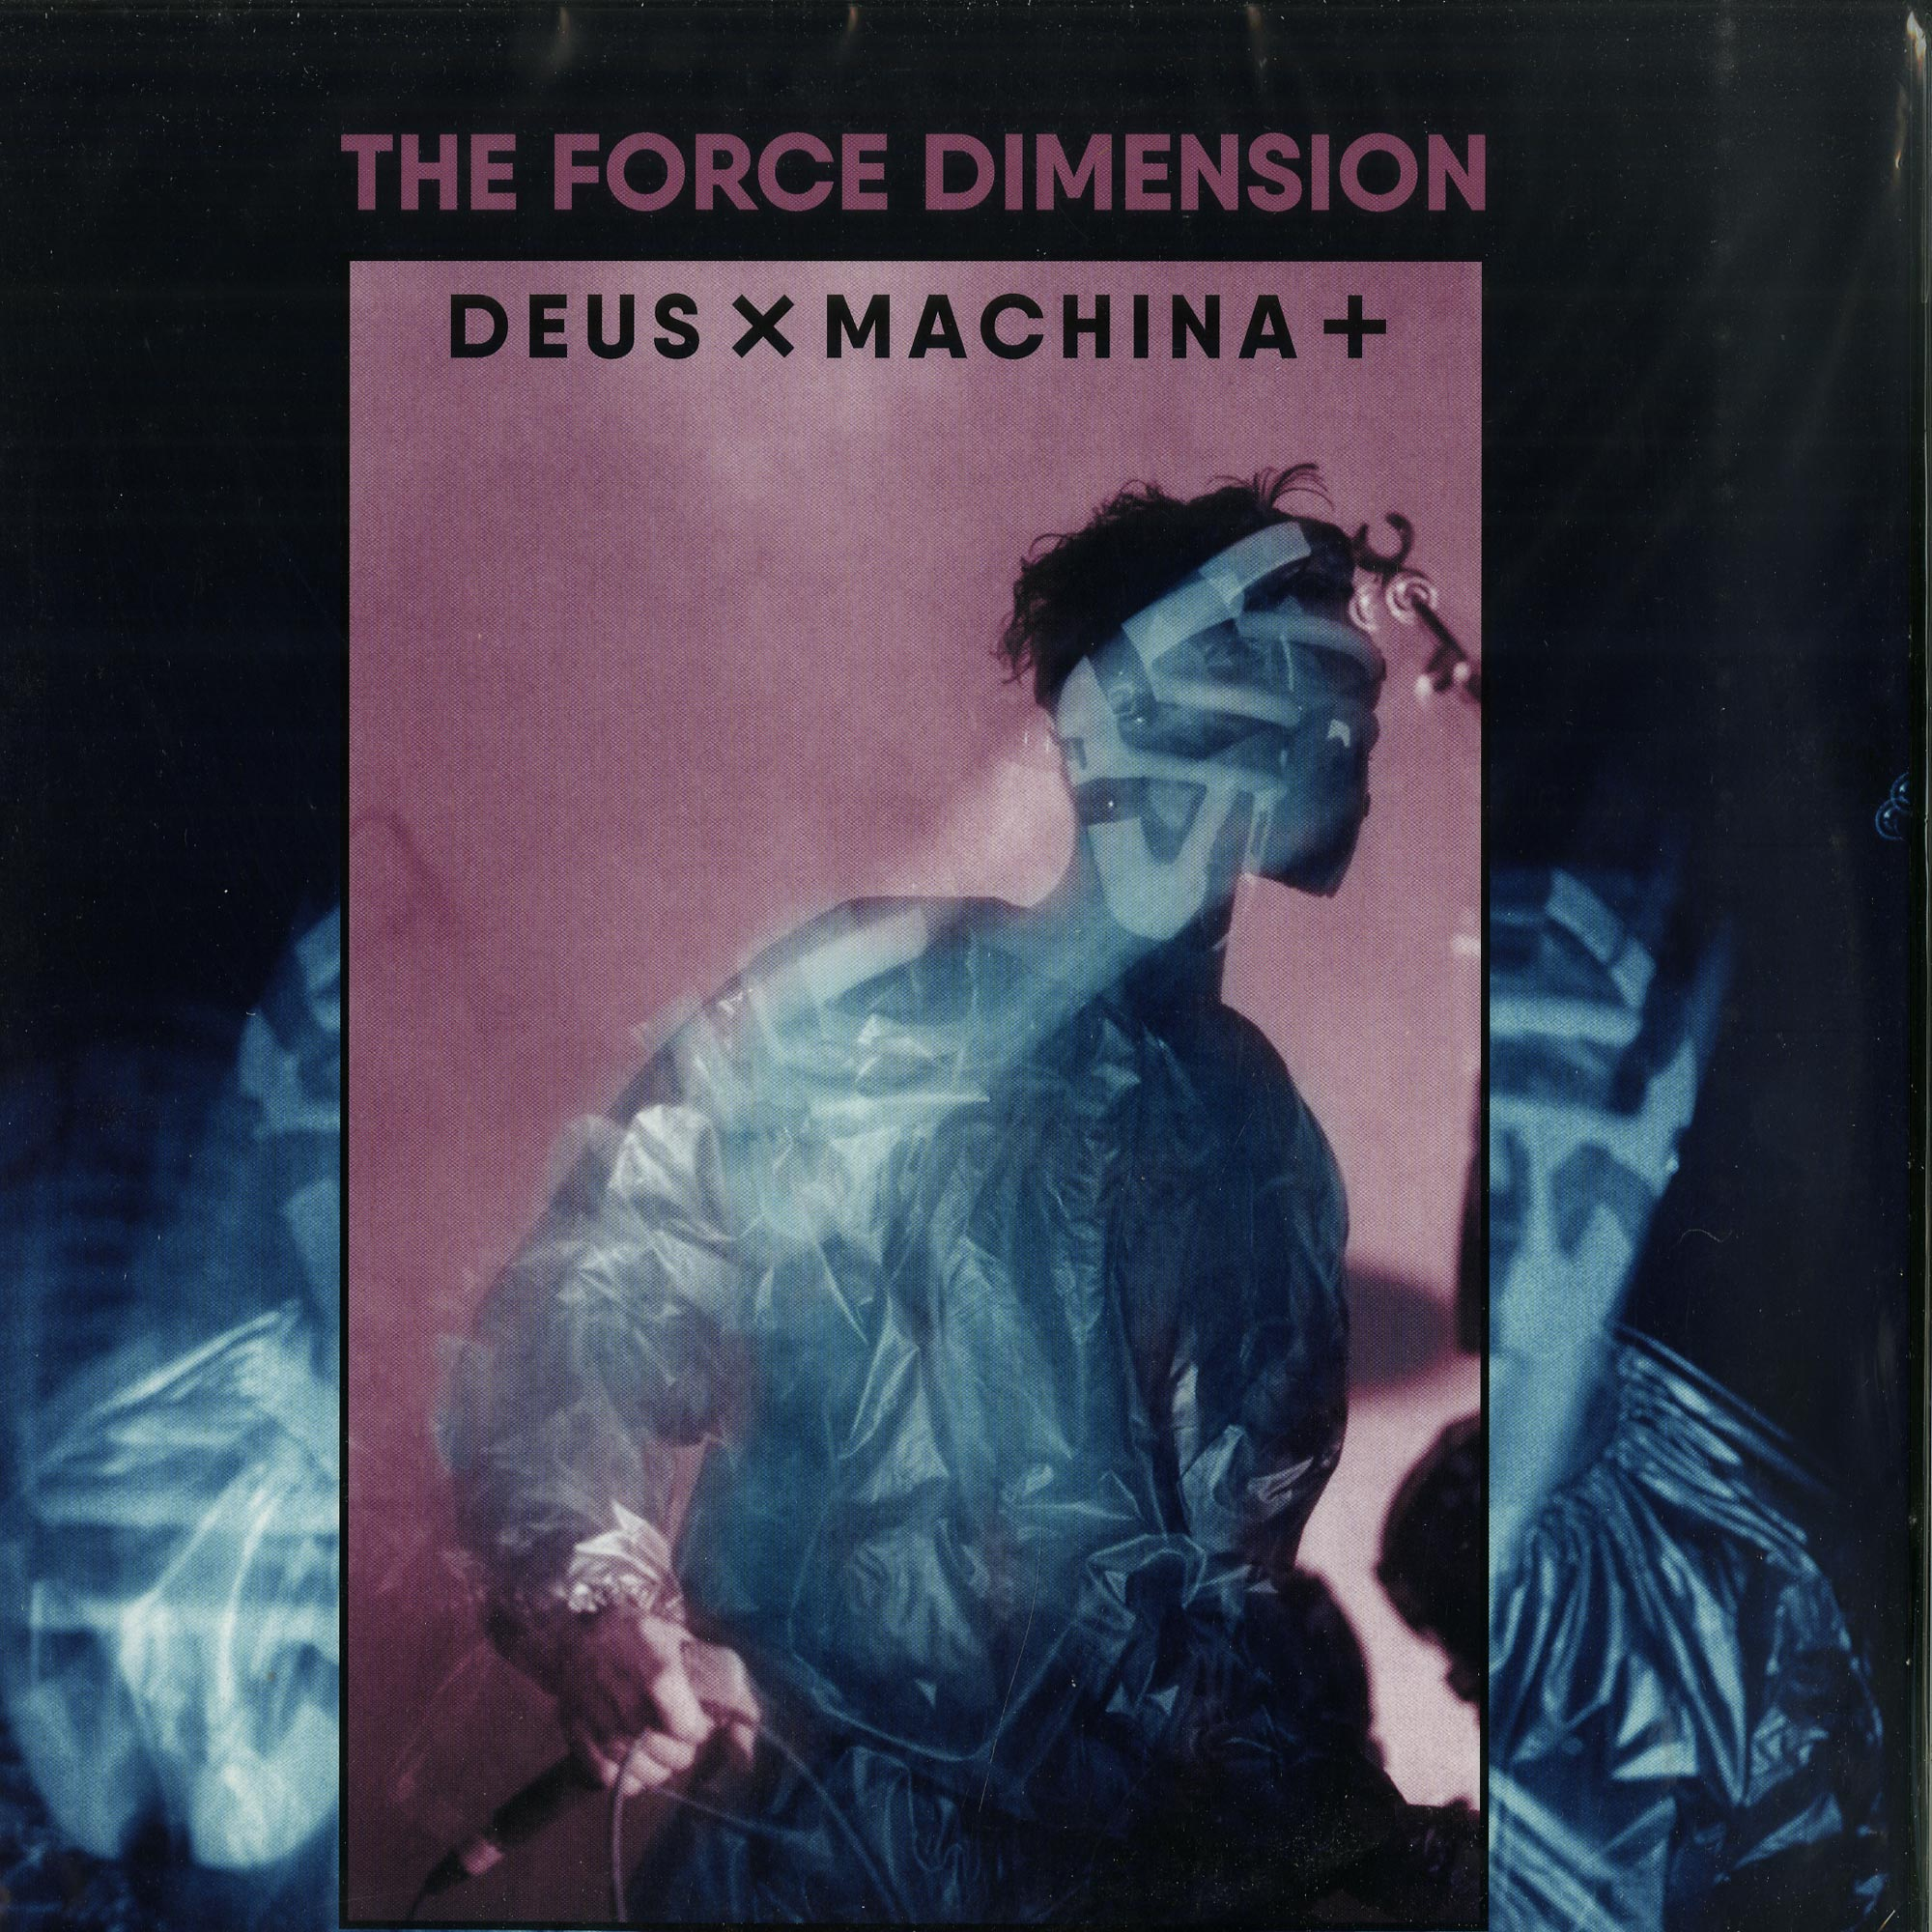 The Force Dimension - DEUS X MACHINA